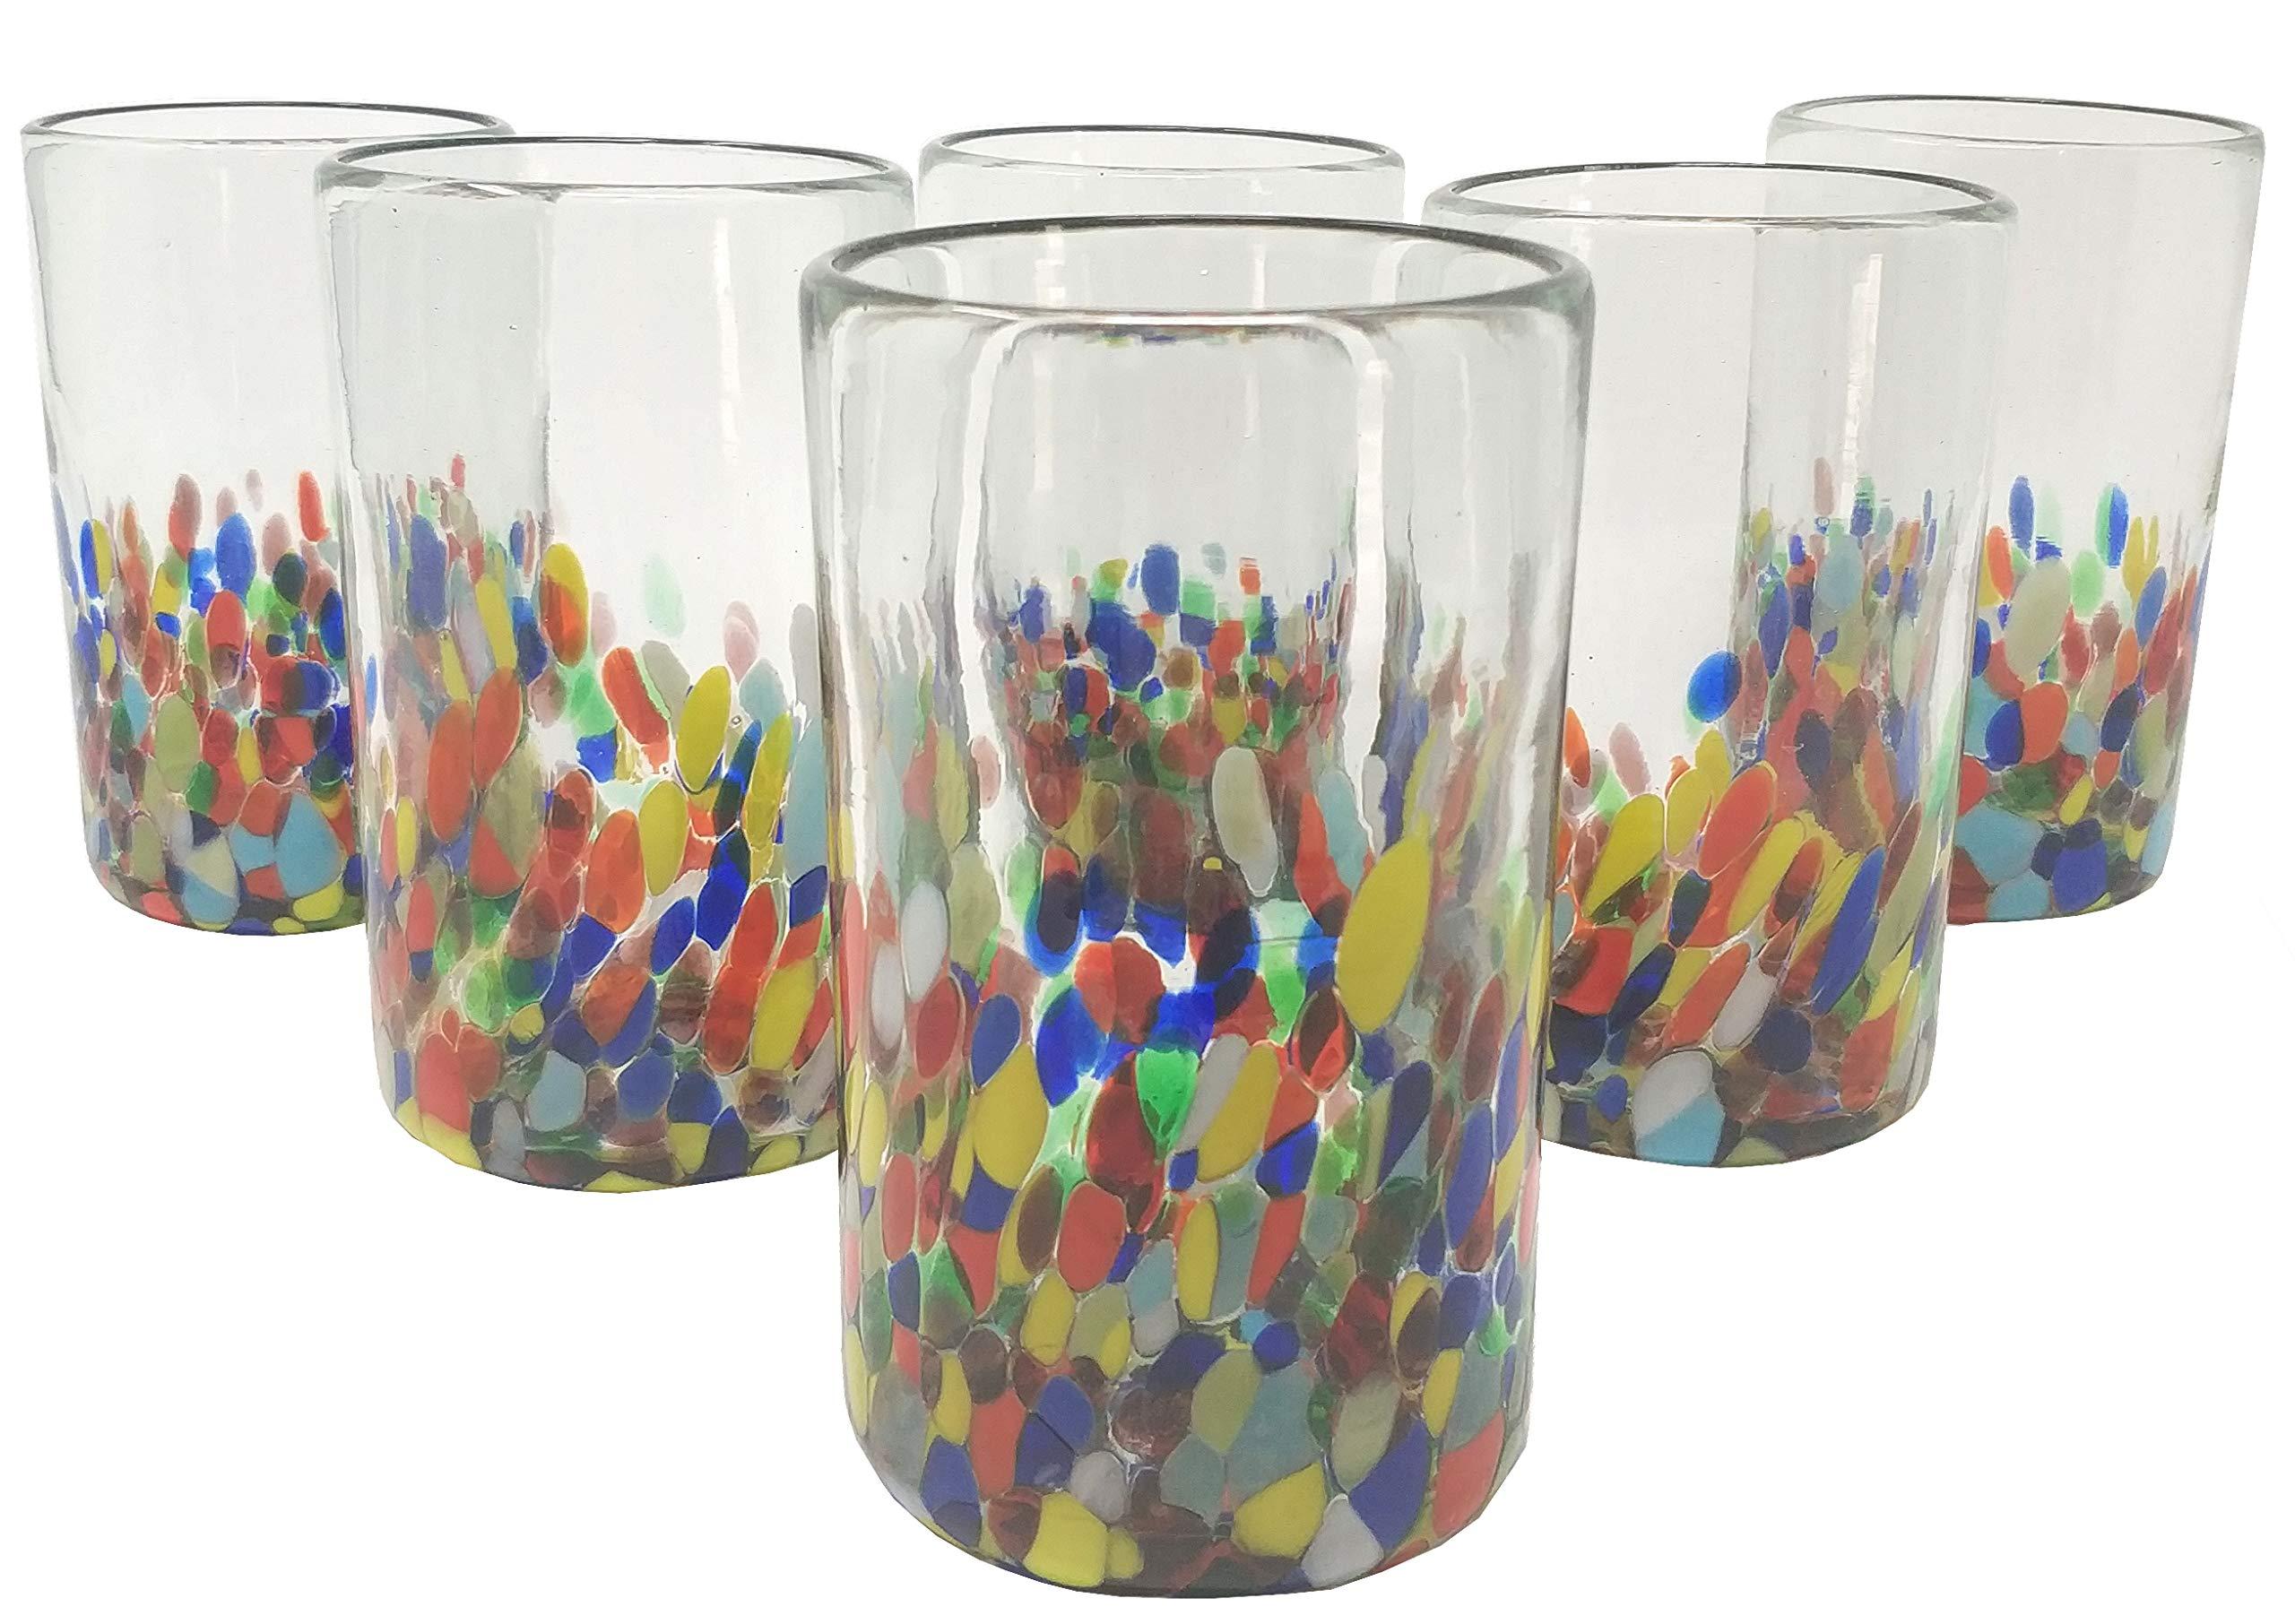 Hand Blown Mexican Drinking Glasses - Set of 6 Confetti Carmen Design Glasses (14 oz each)